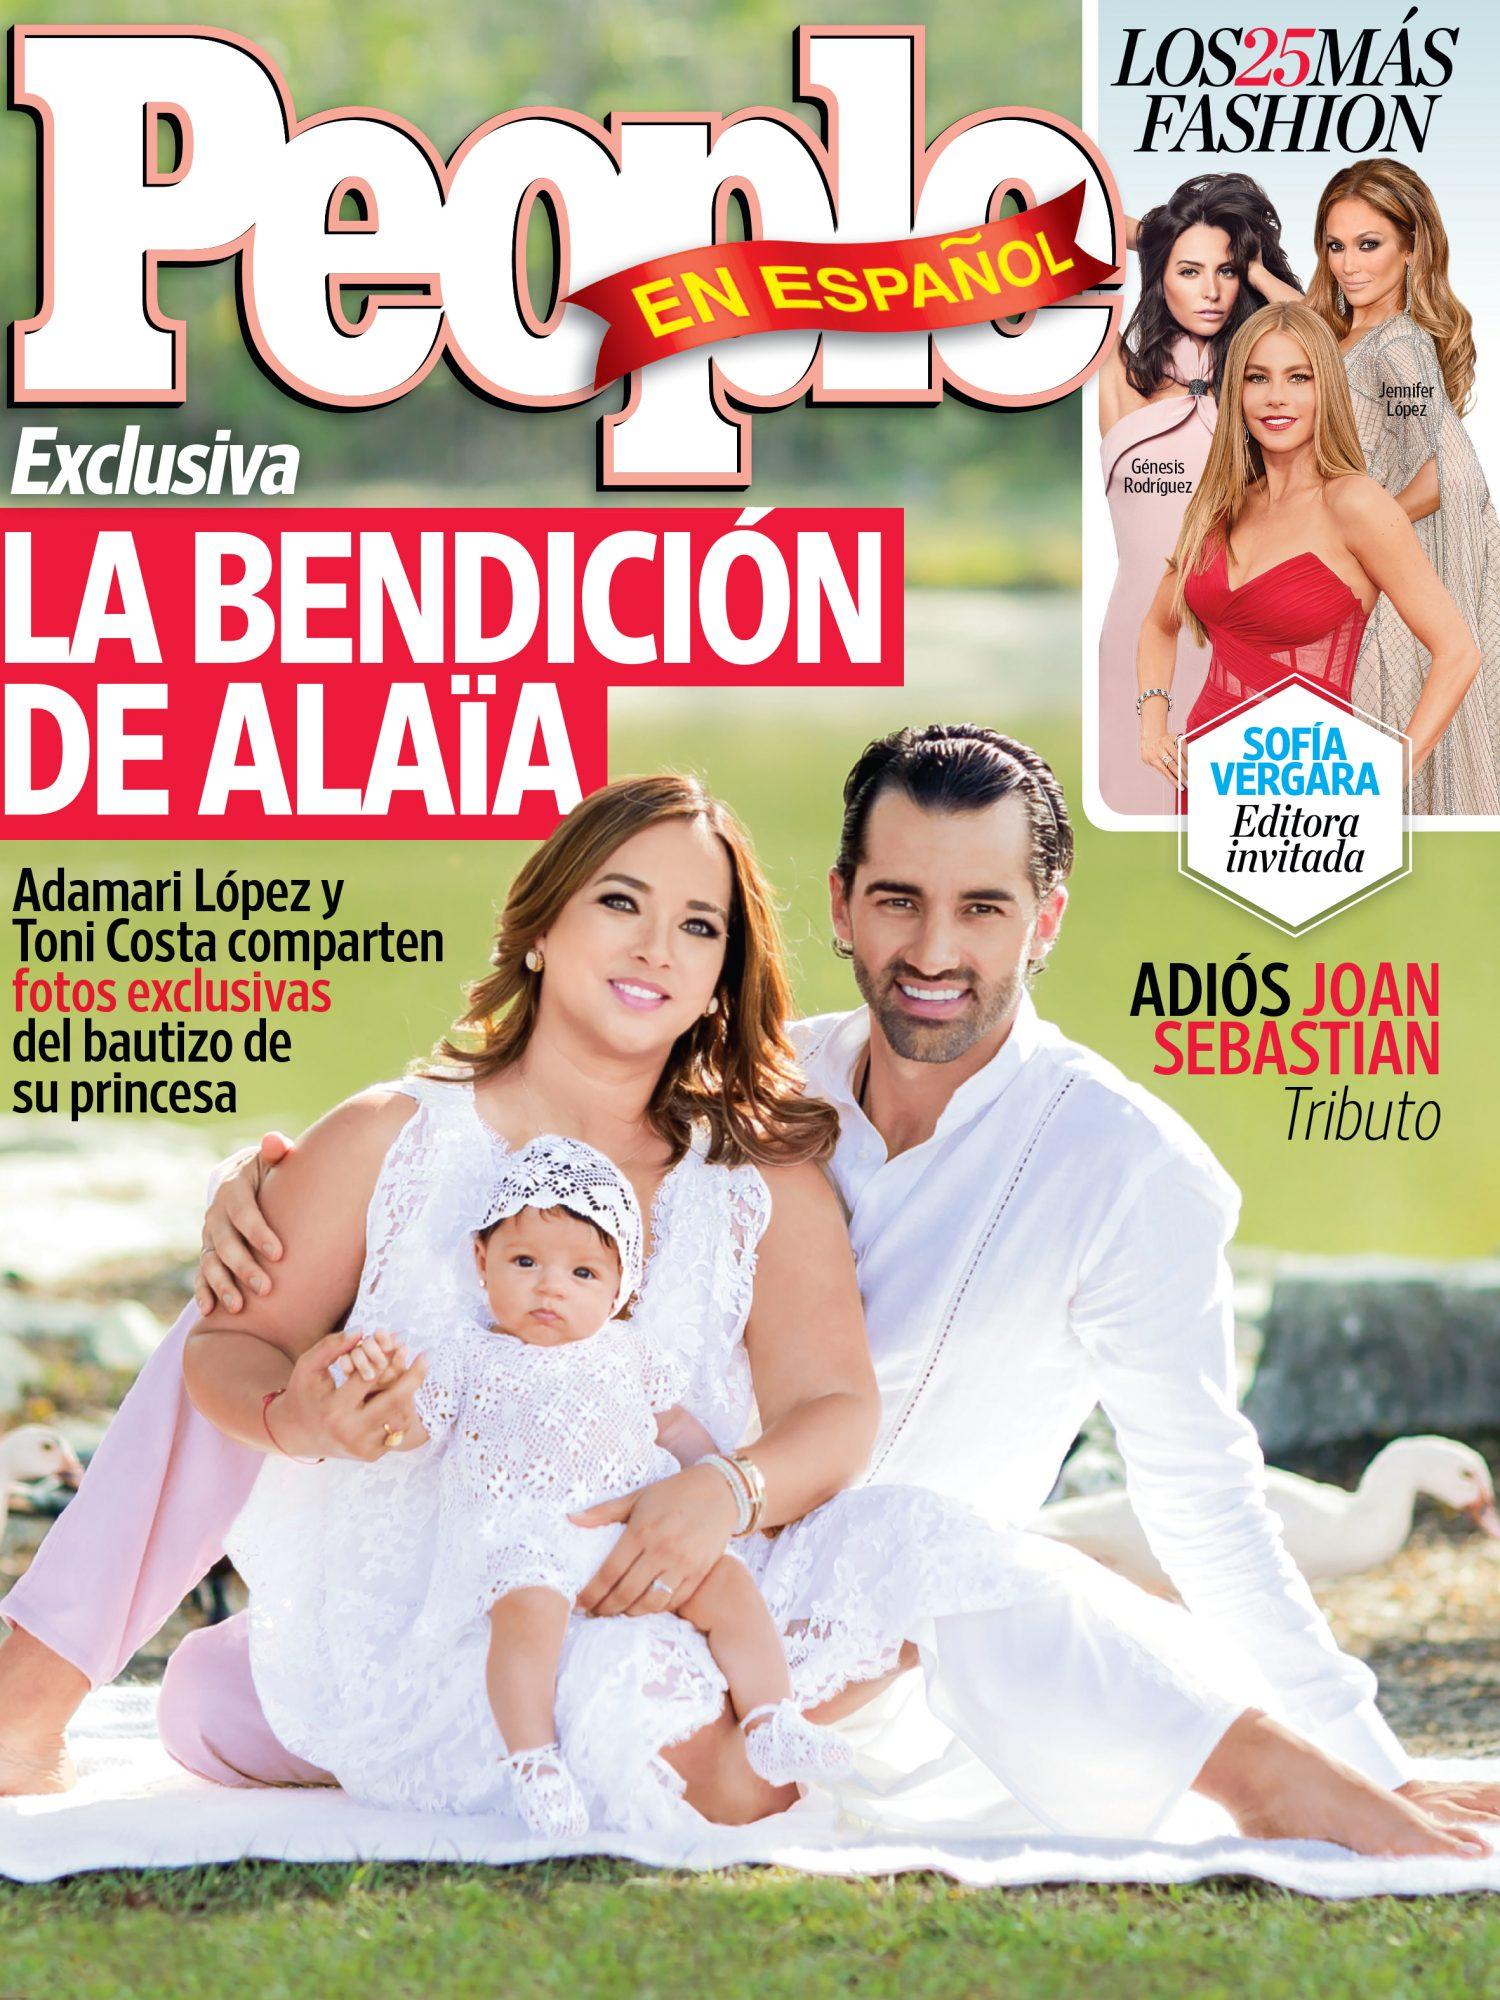 Adamari Lopez y Toni Costa - Septiembre 2015 Portada Cover